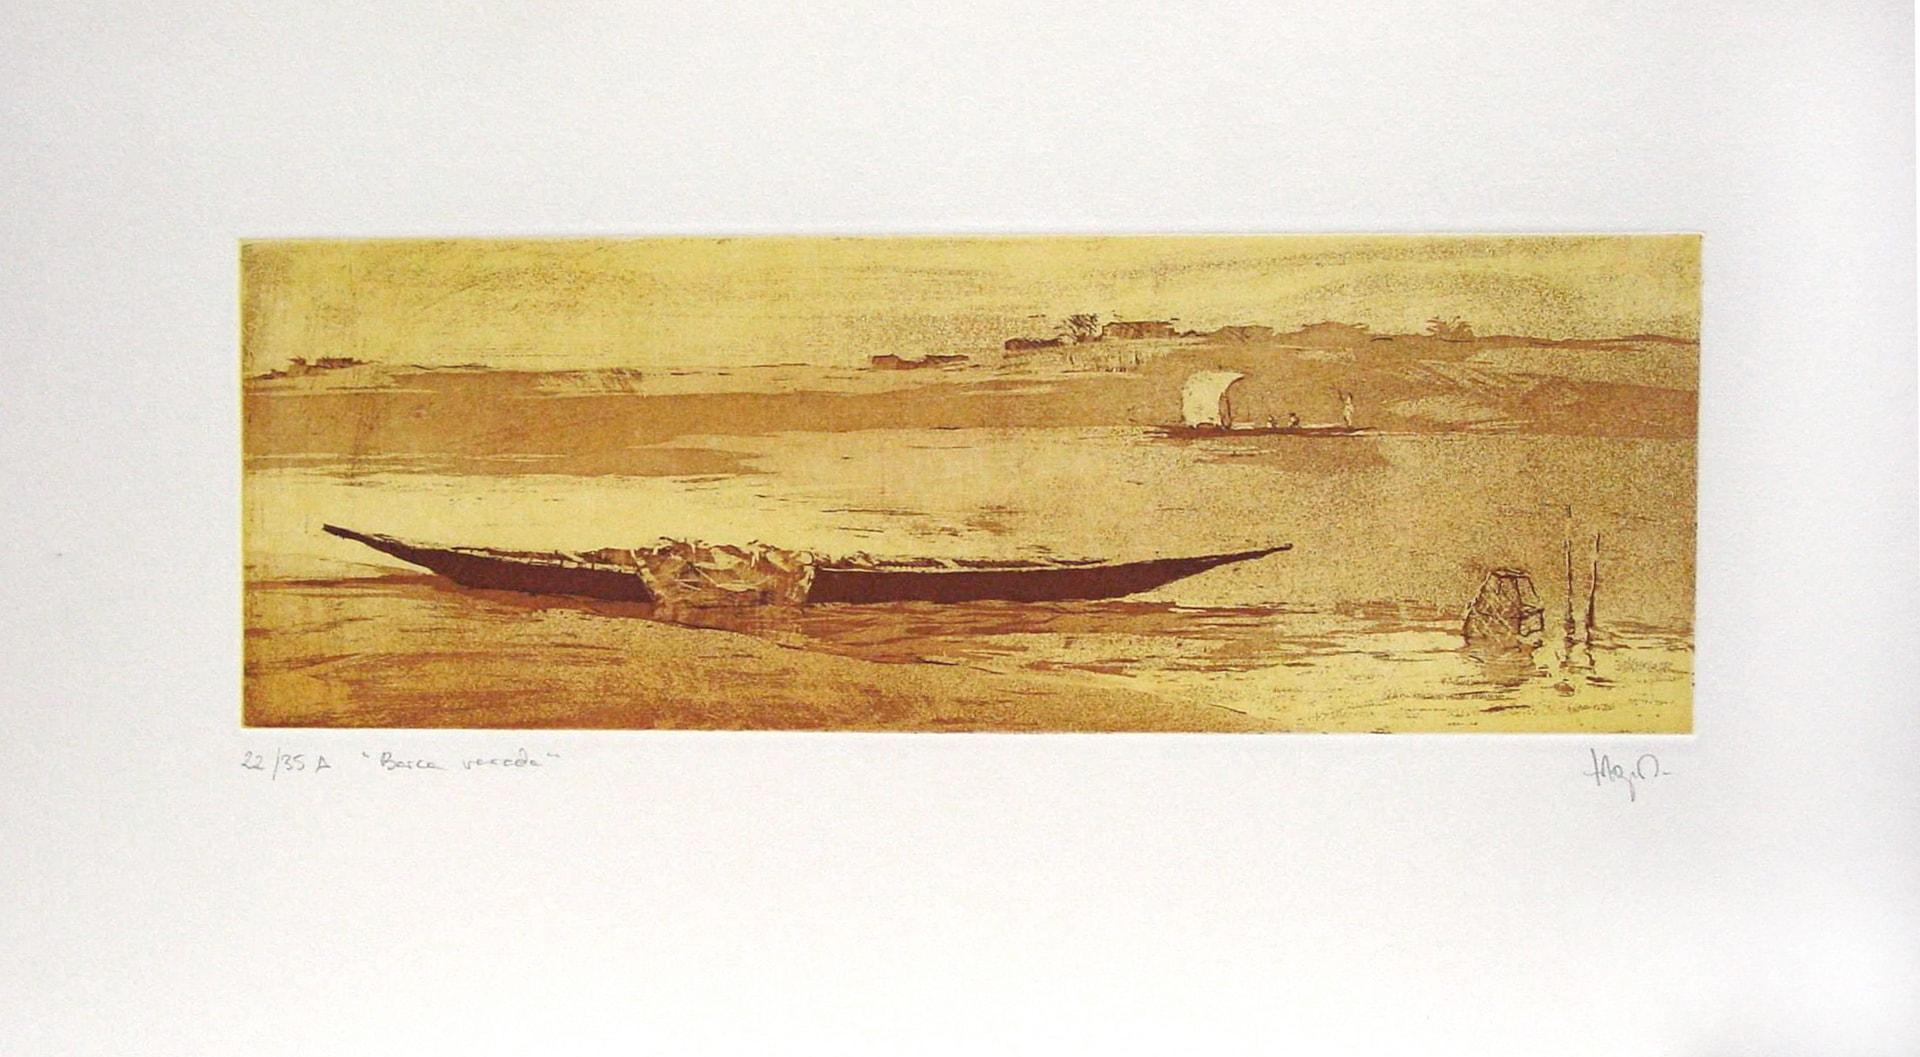 Barca varada 61 x 34 cm Aguatinta y Barniz blando